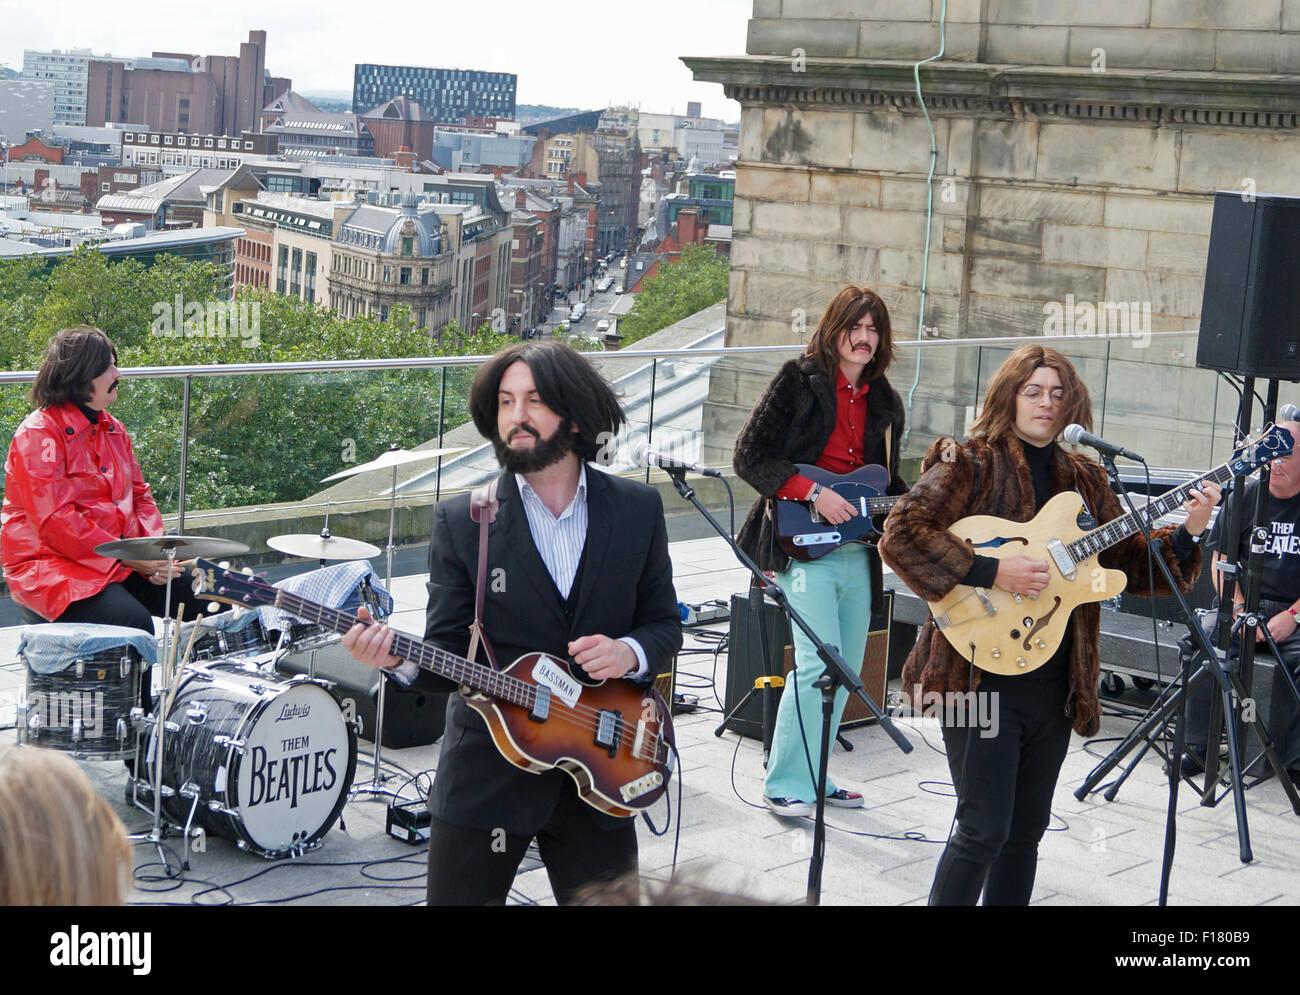 Liverpool, UK. 29th Aug, 2015. Them Beatles, a Scottish Beatles tribute band, recreated the Beatles last public - Stock Image